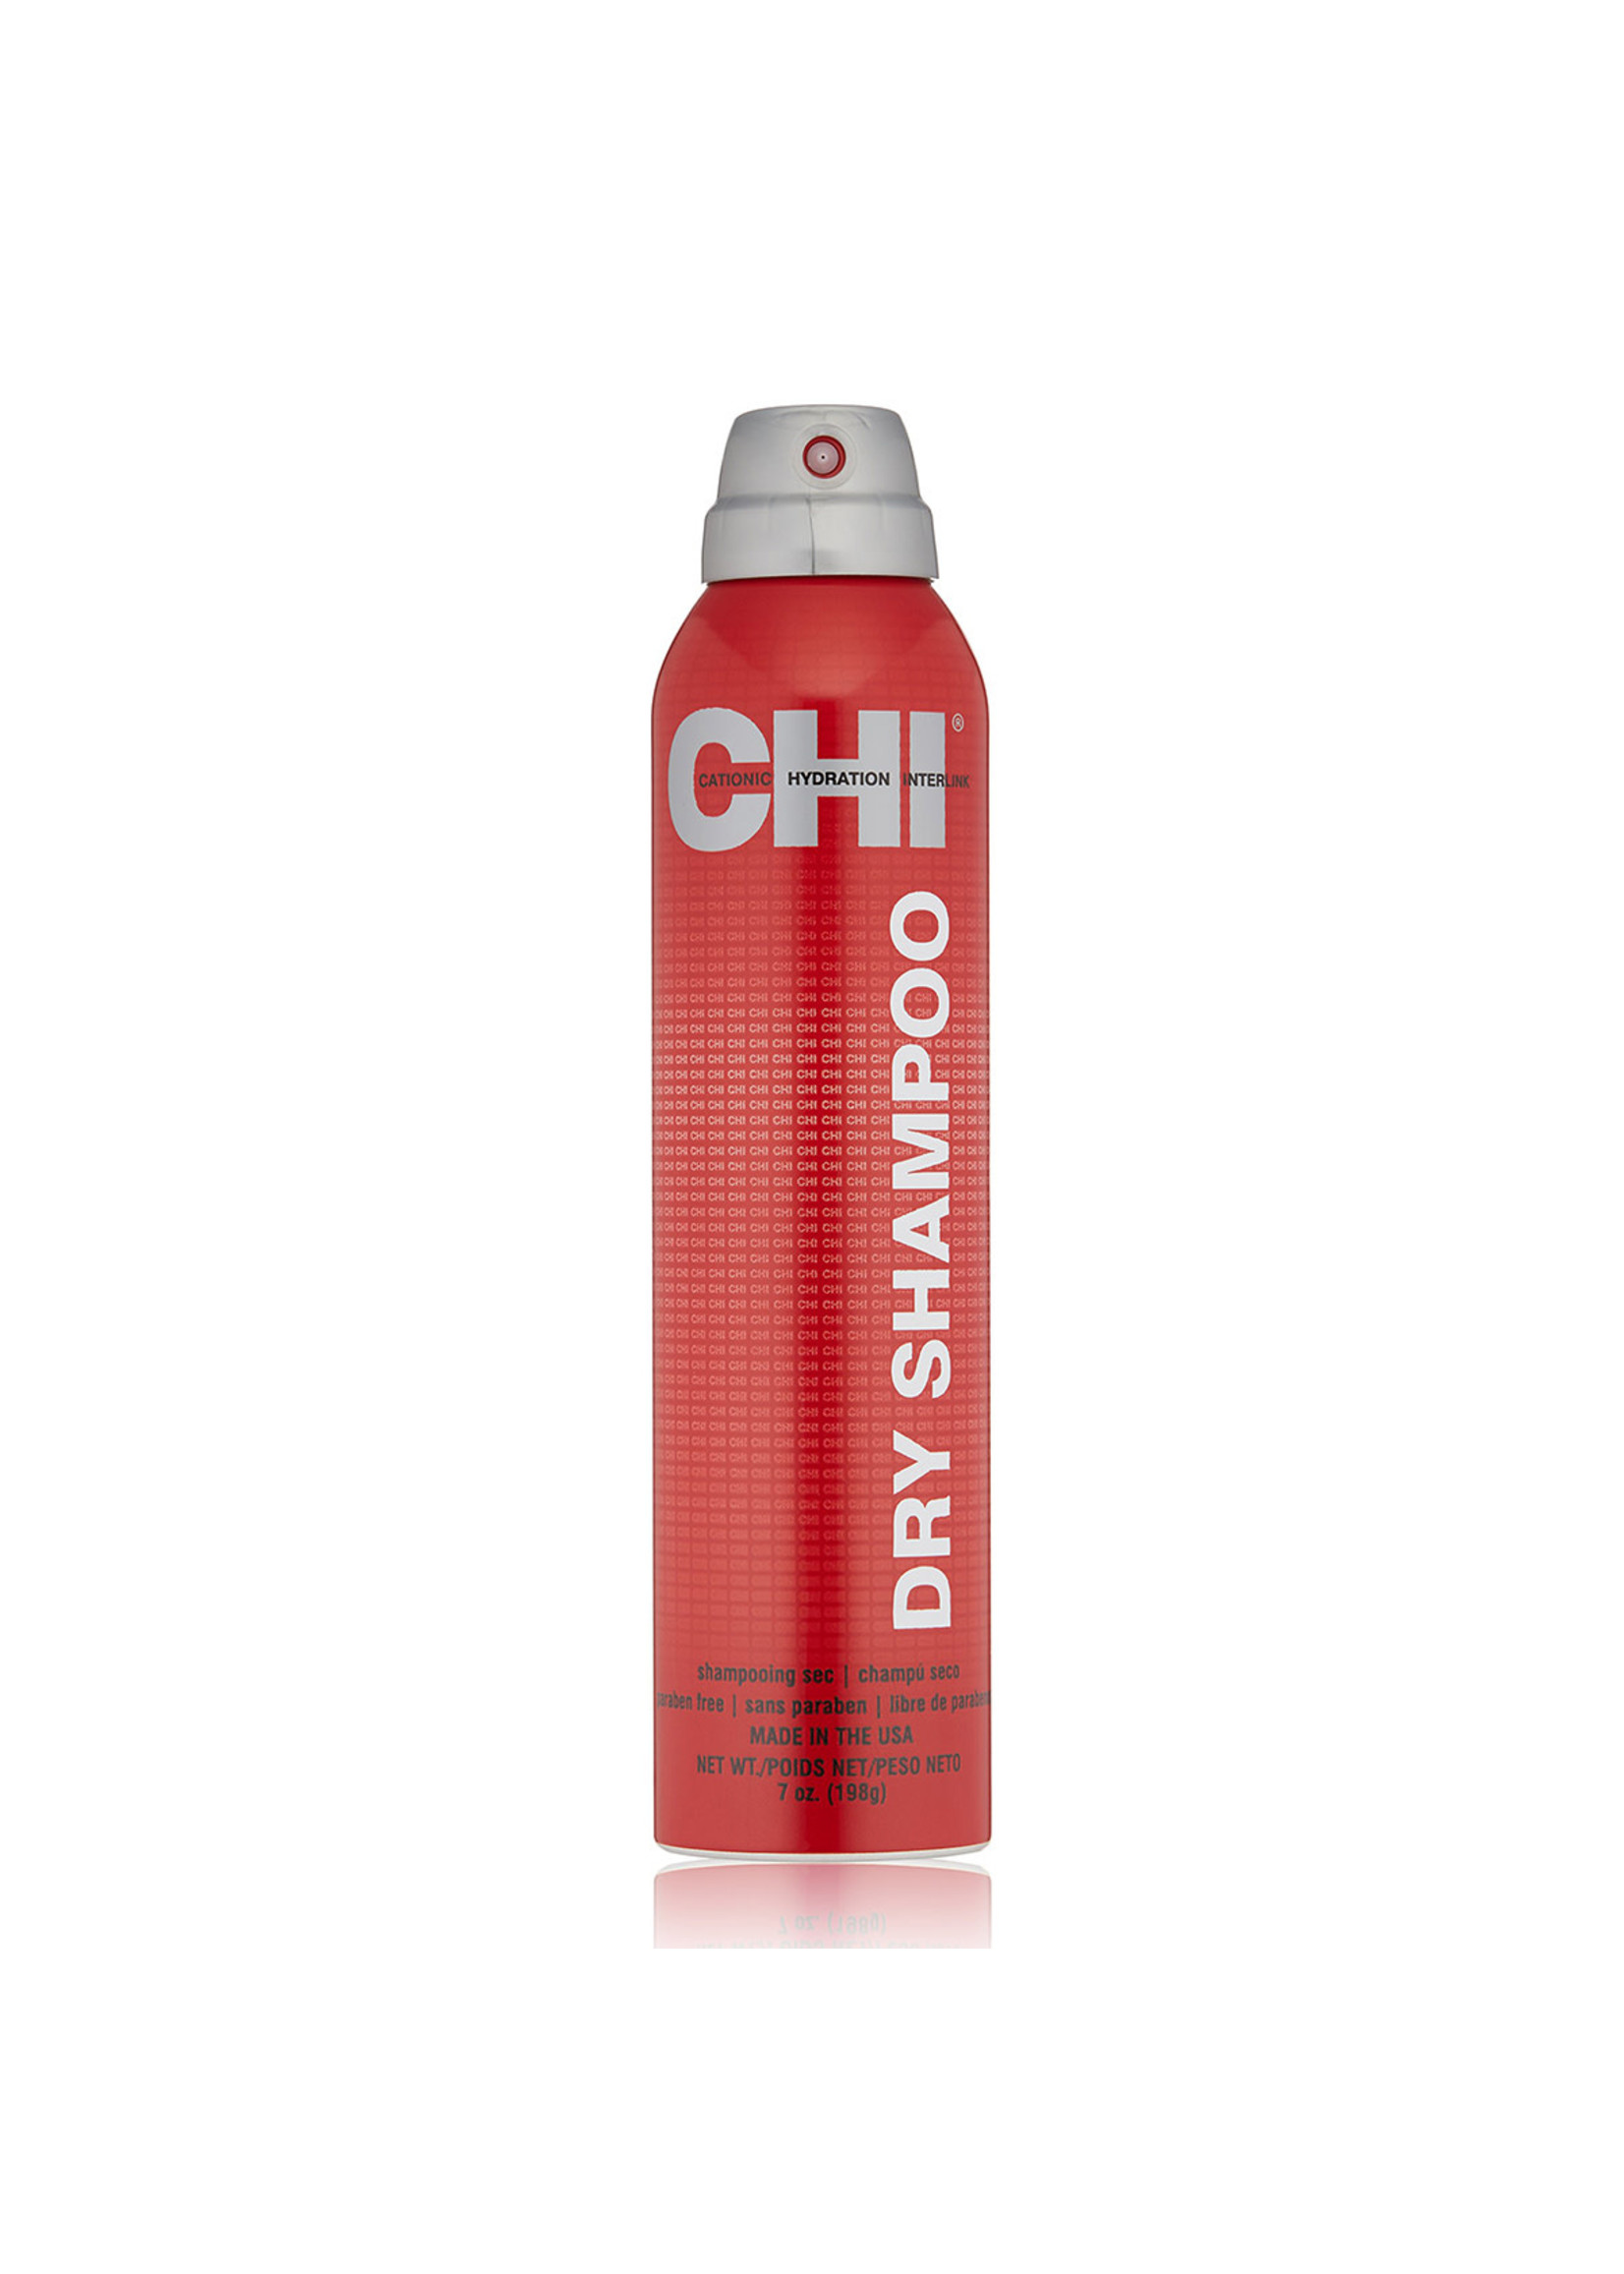 CHI Styling Dry Shampoo 7oz